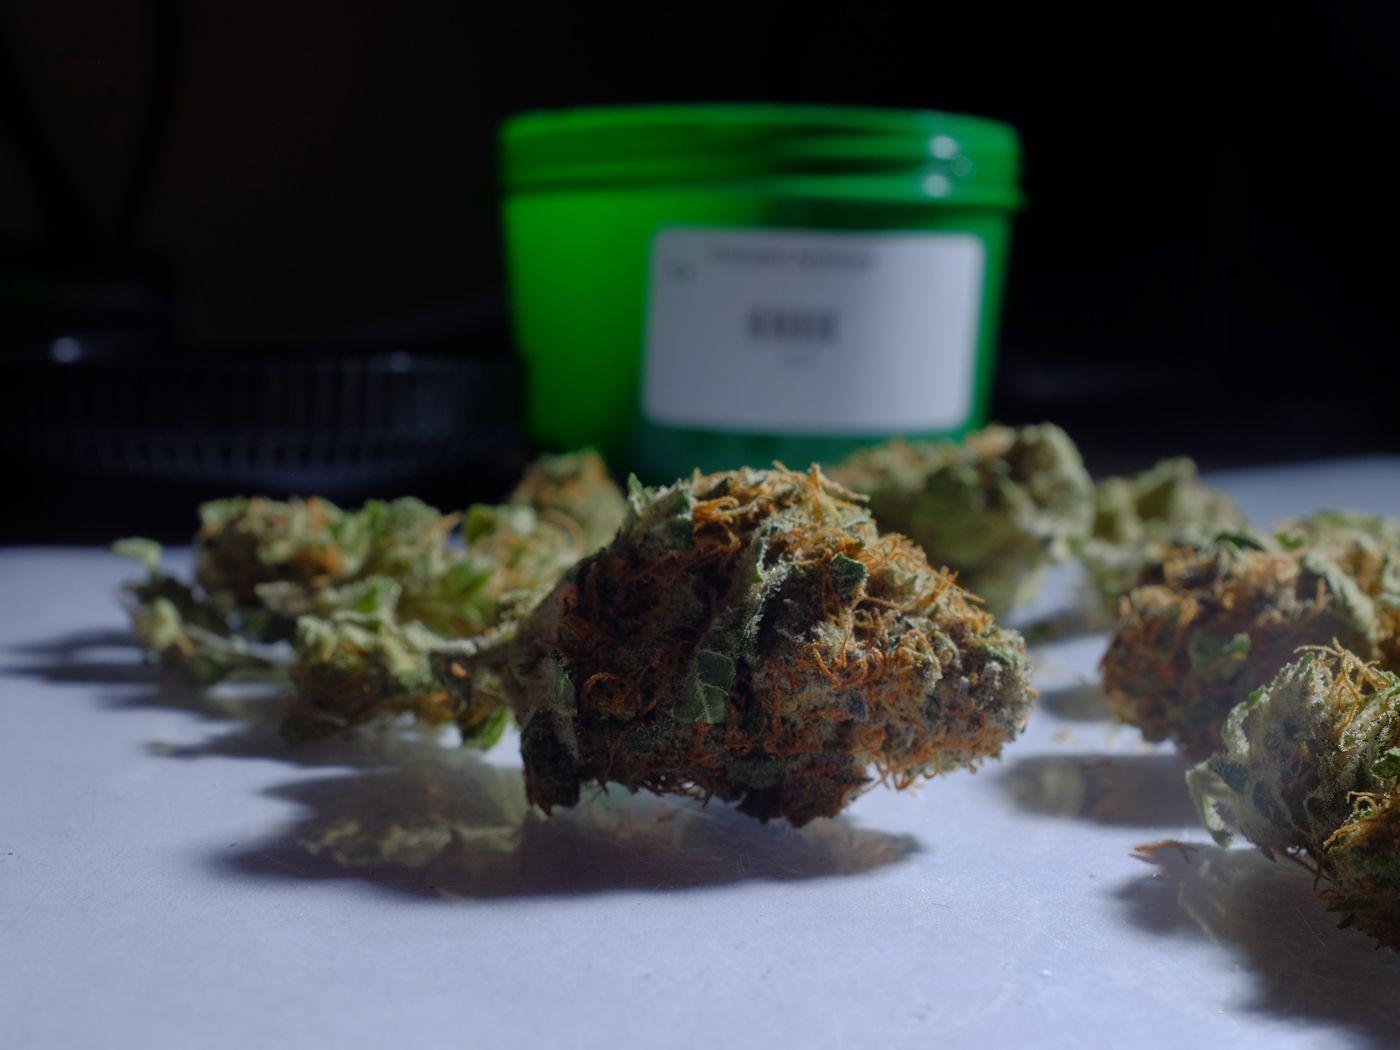 The best argument against marijuana legalization - Vox